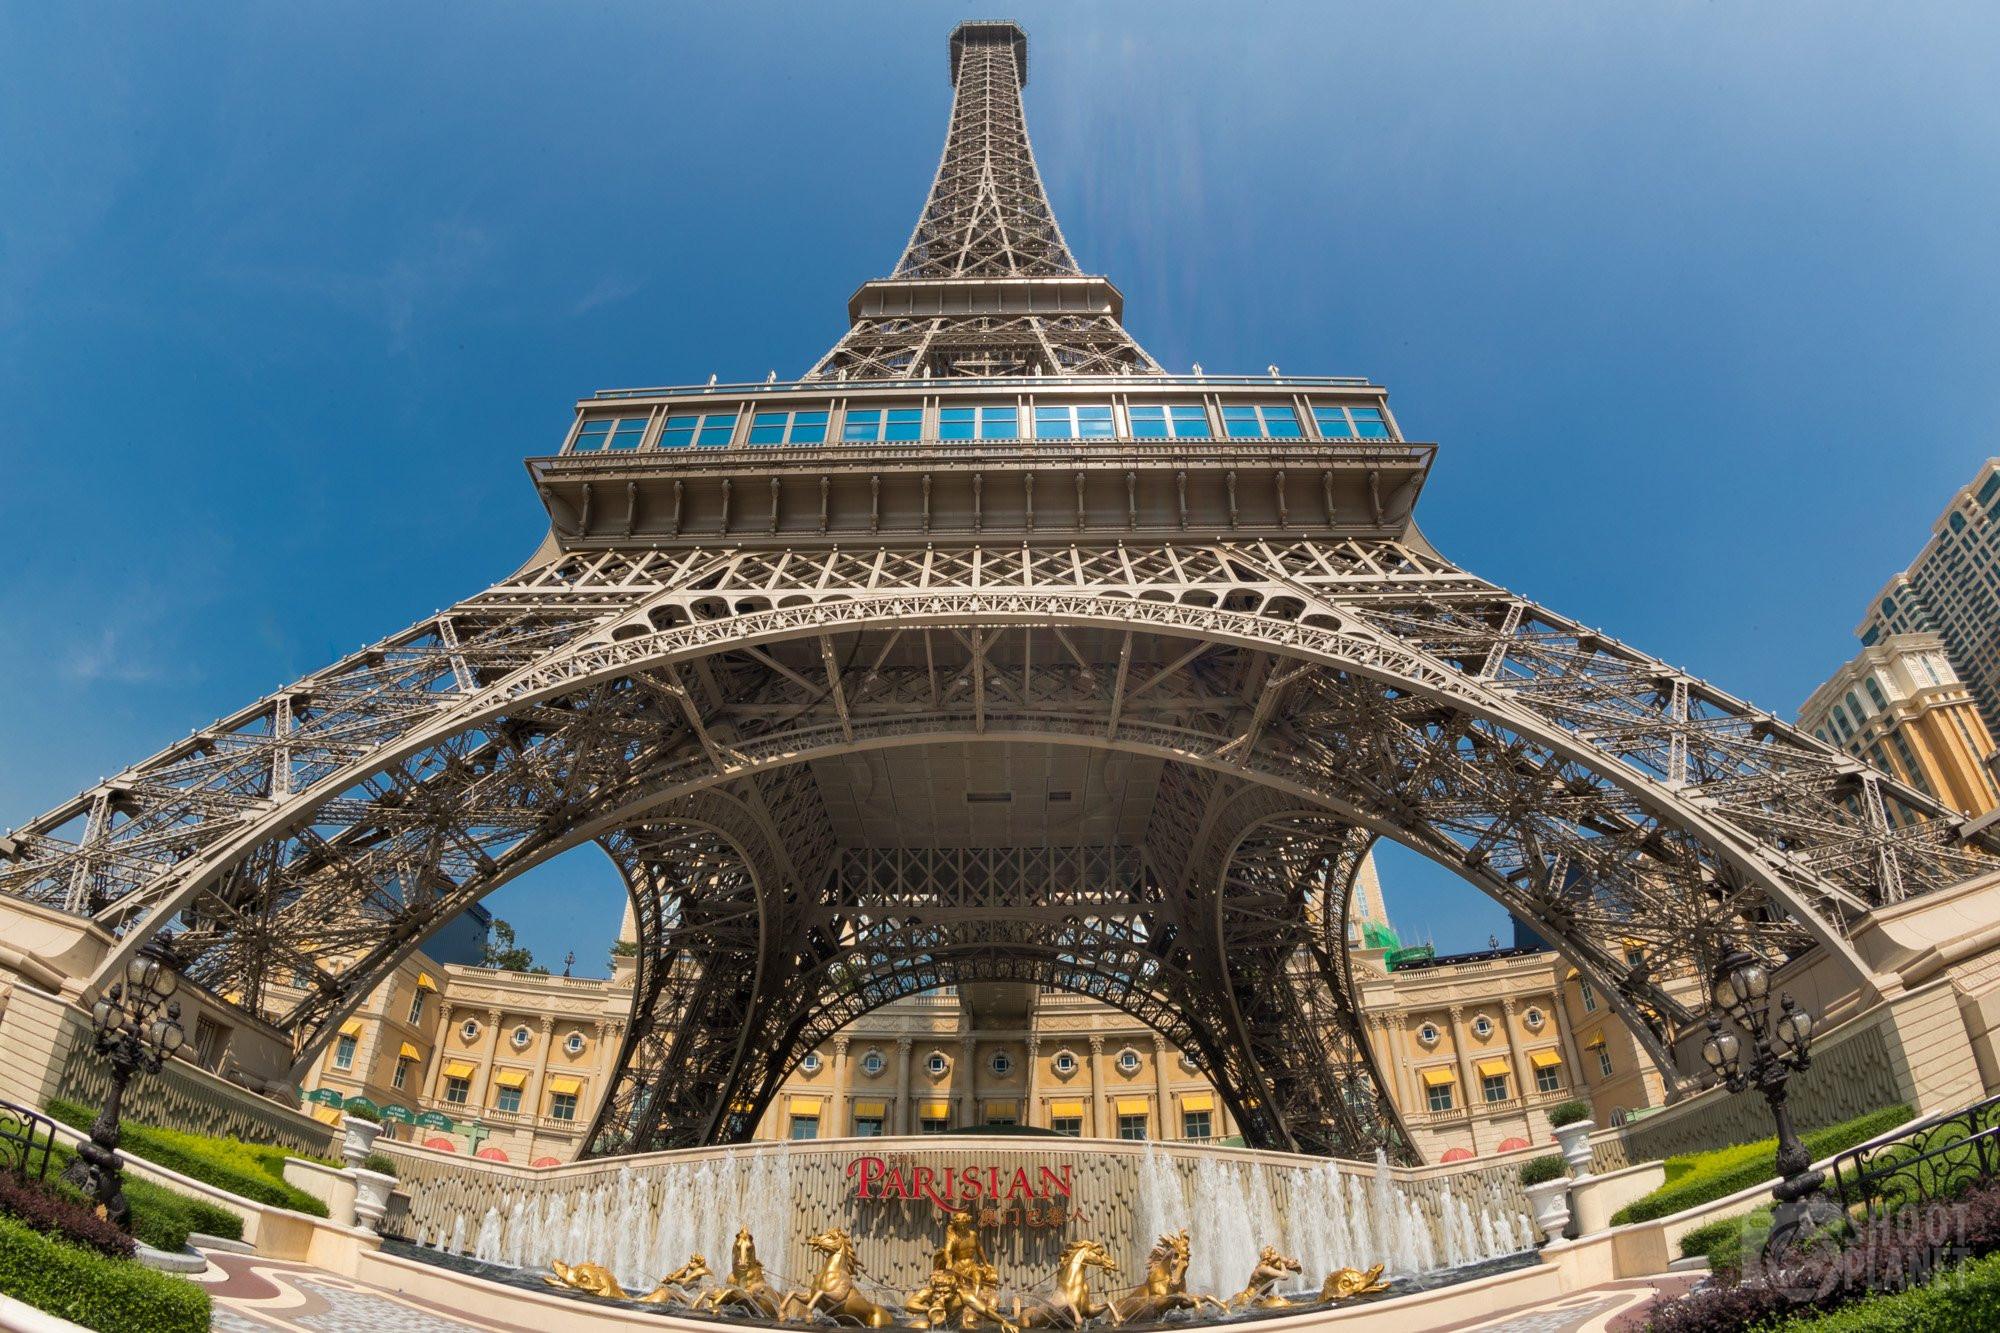 Eiffel Tower replica, Macao, China